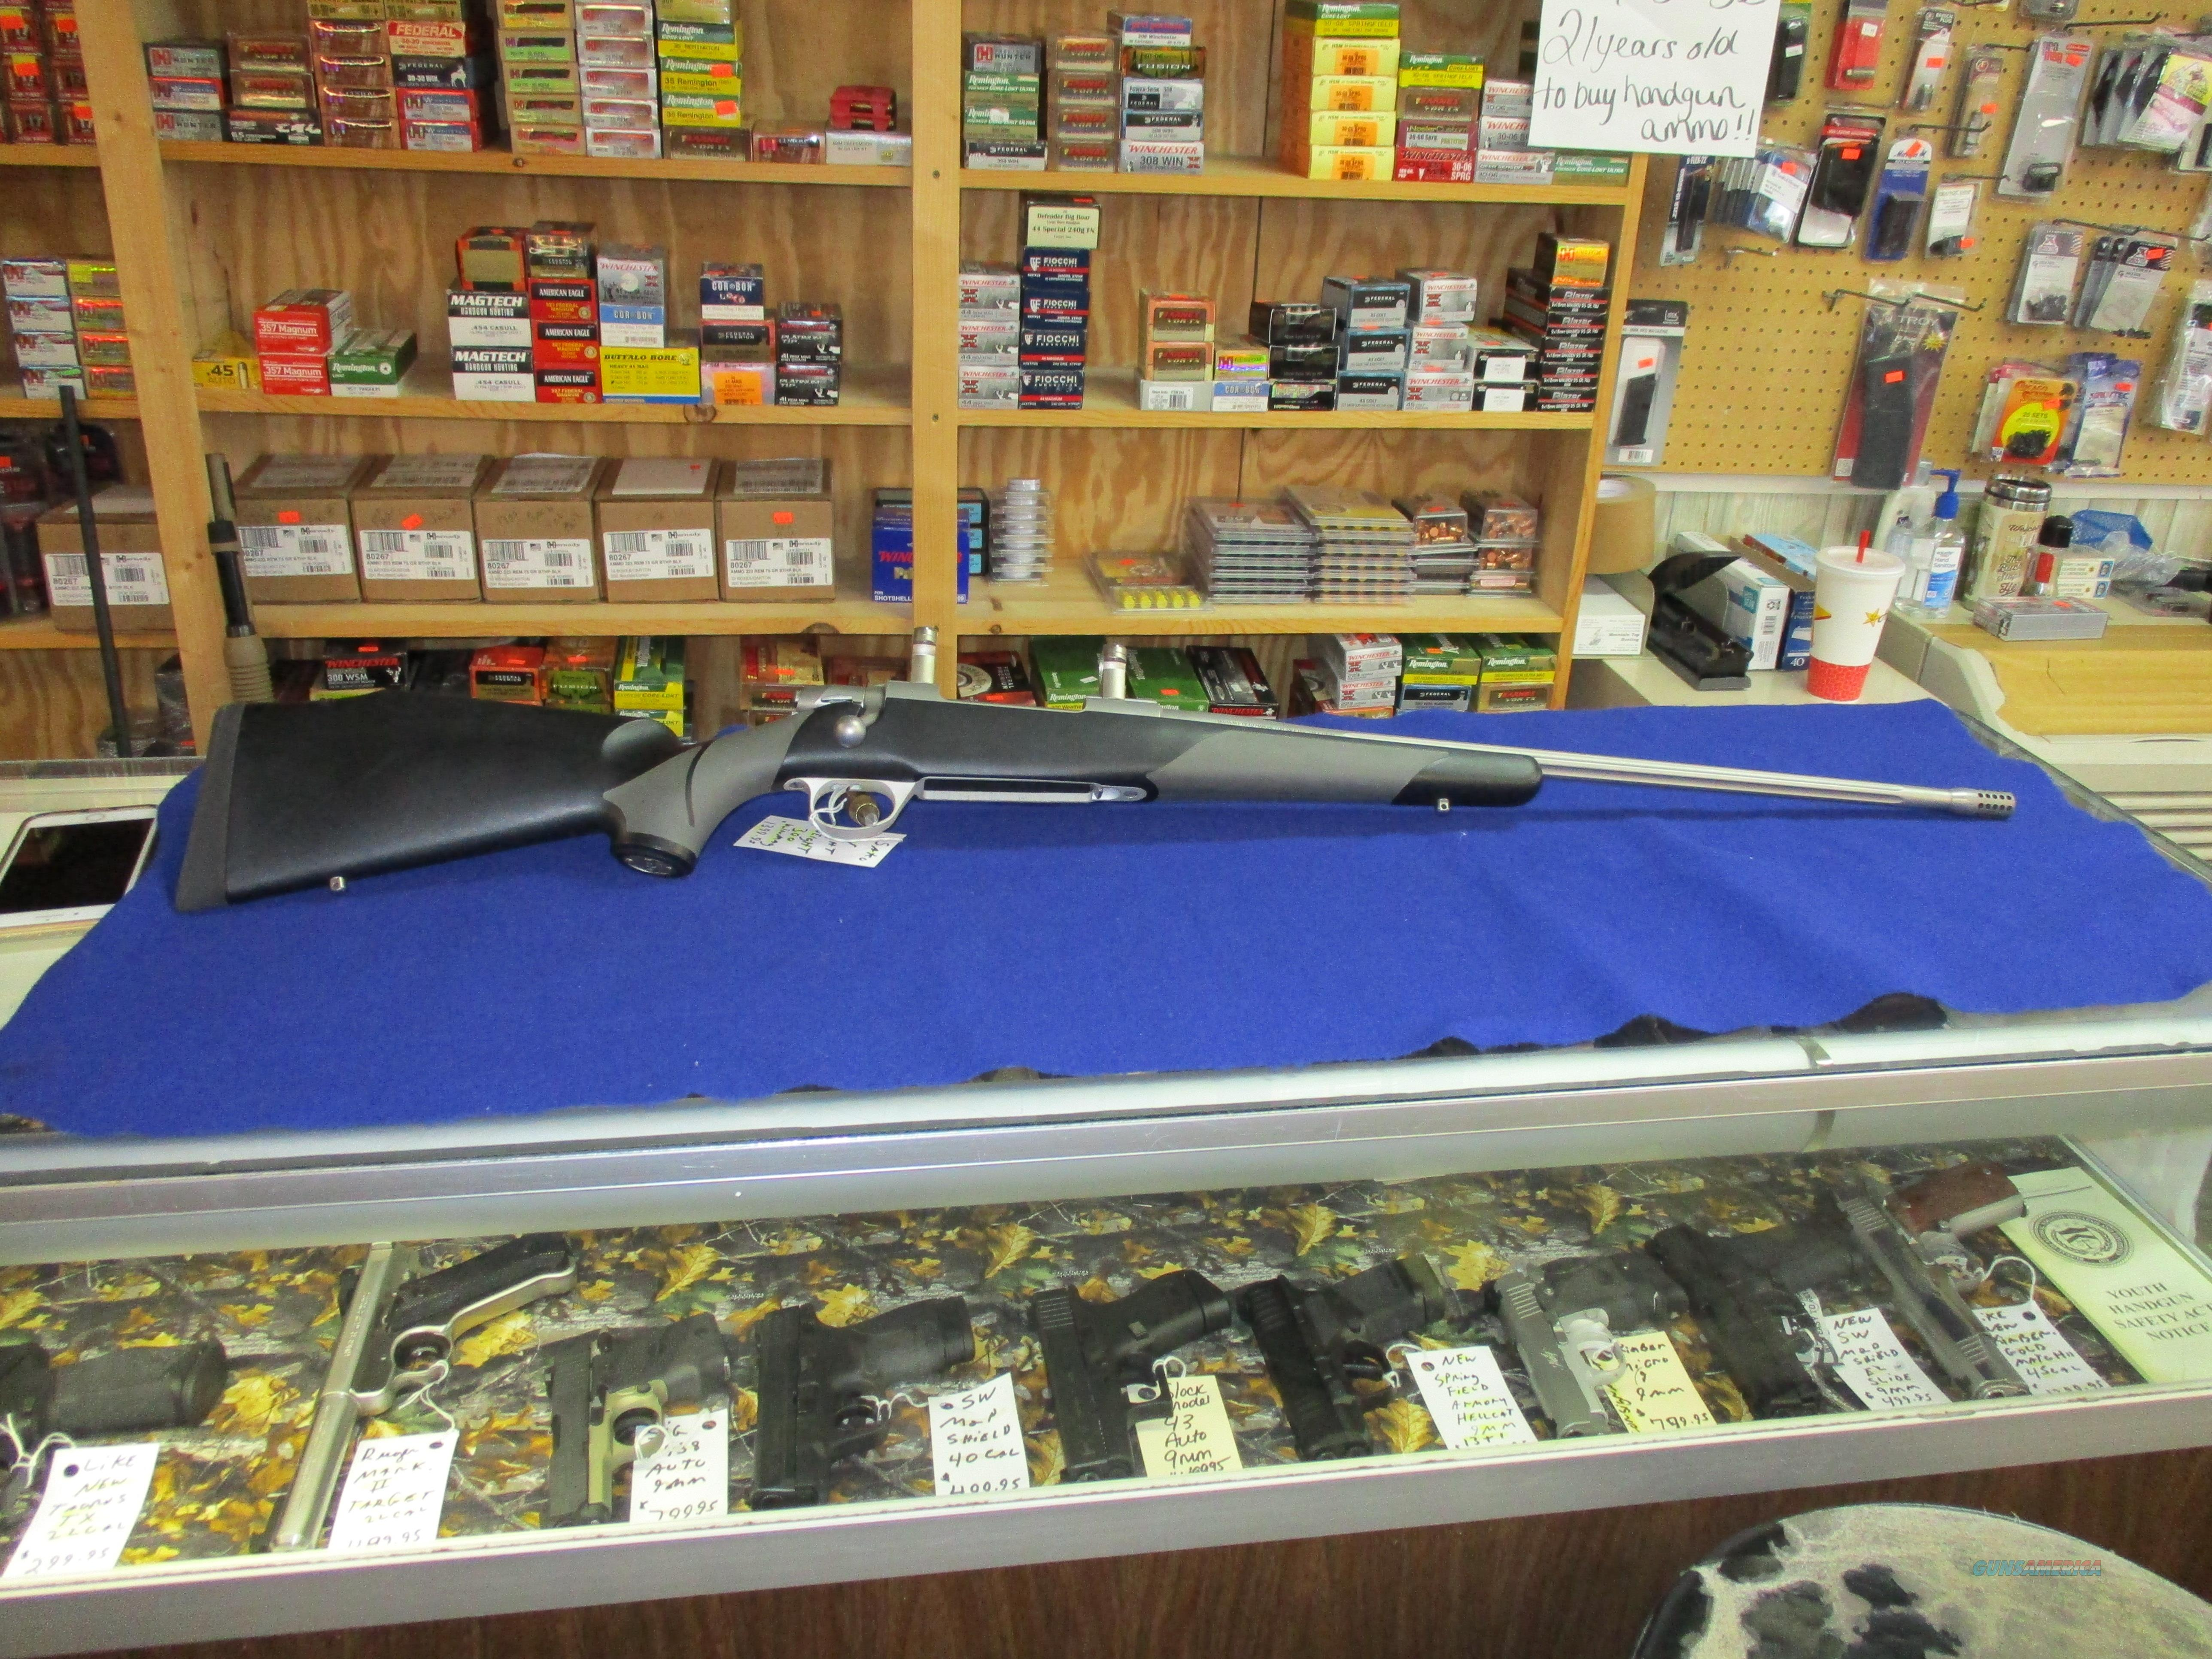 SAKO V LIGHT WEIGHT 300 WIN MAG  Guns > Rifles > Sako Rifles > Other Bolt Action